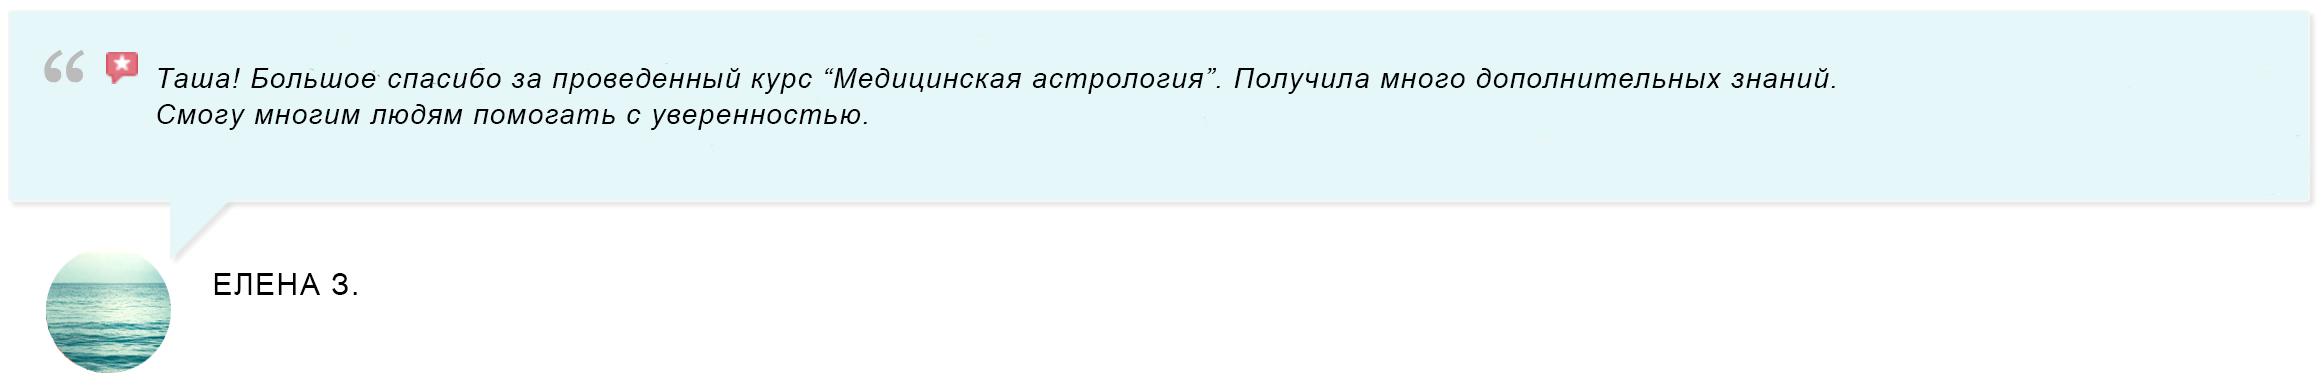 https://astrologtasha.ru/wp-content/uploads/2020/10/elena_z_otzyv.jpg